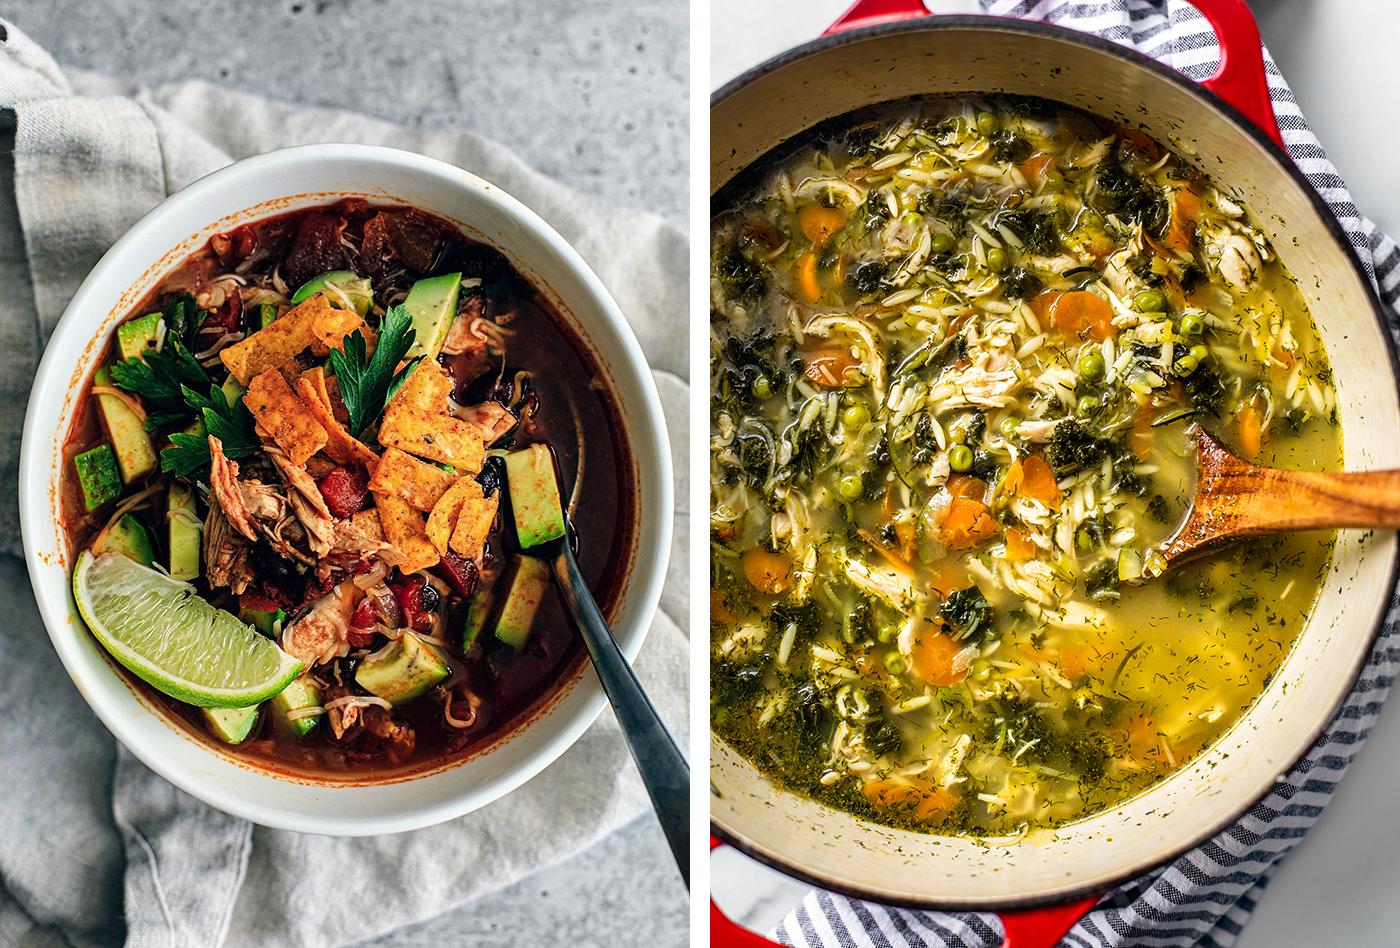 Right: Bowl of chicken tortilla soup; Left: large pot of orzo lemon soup.